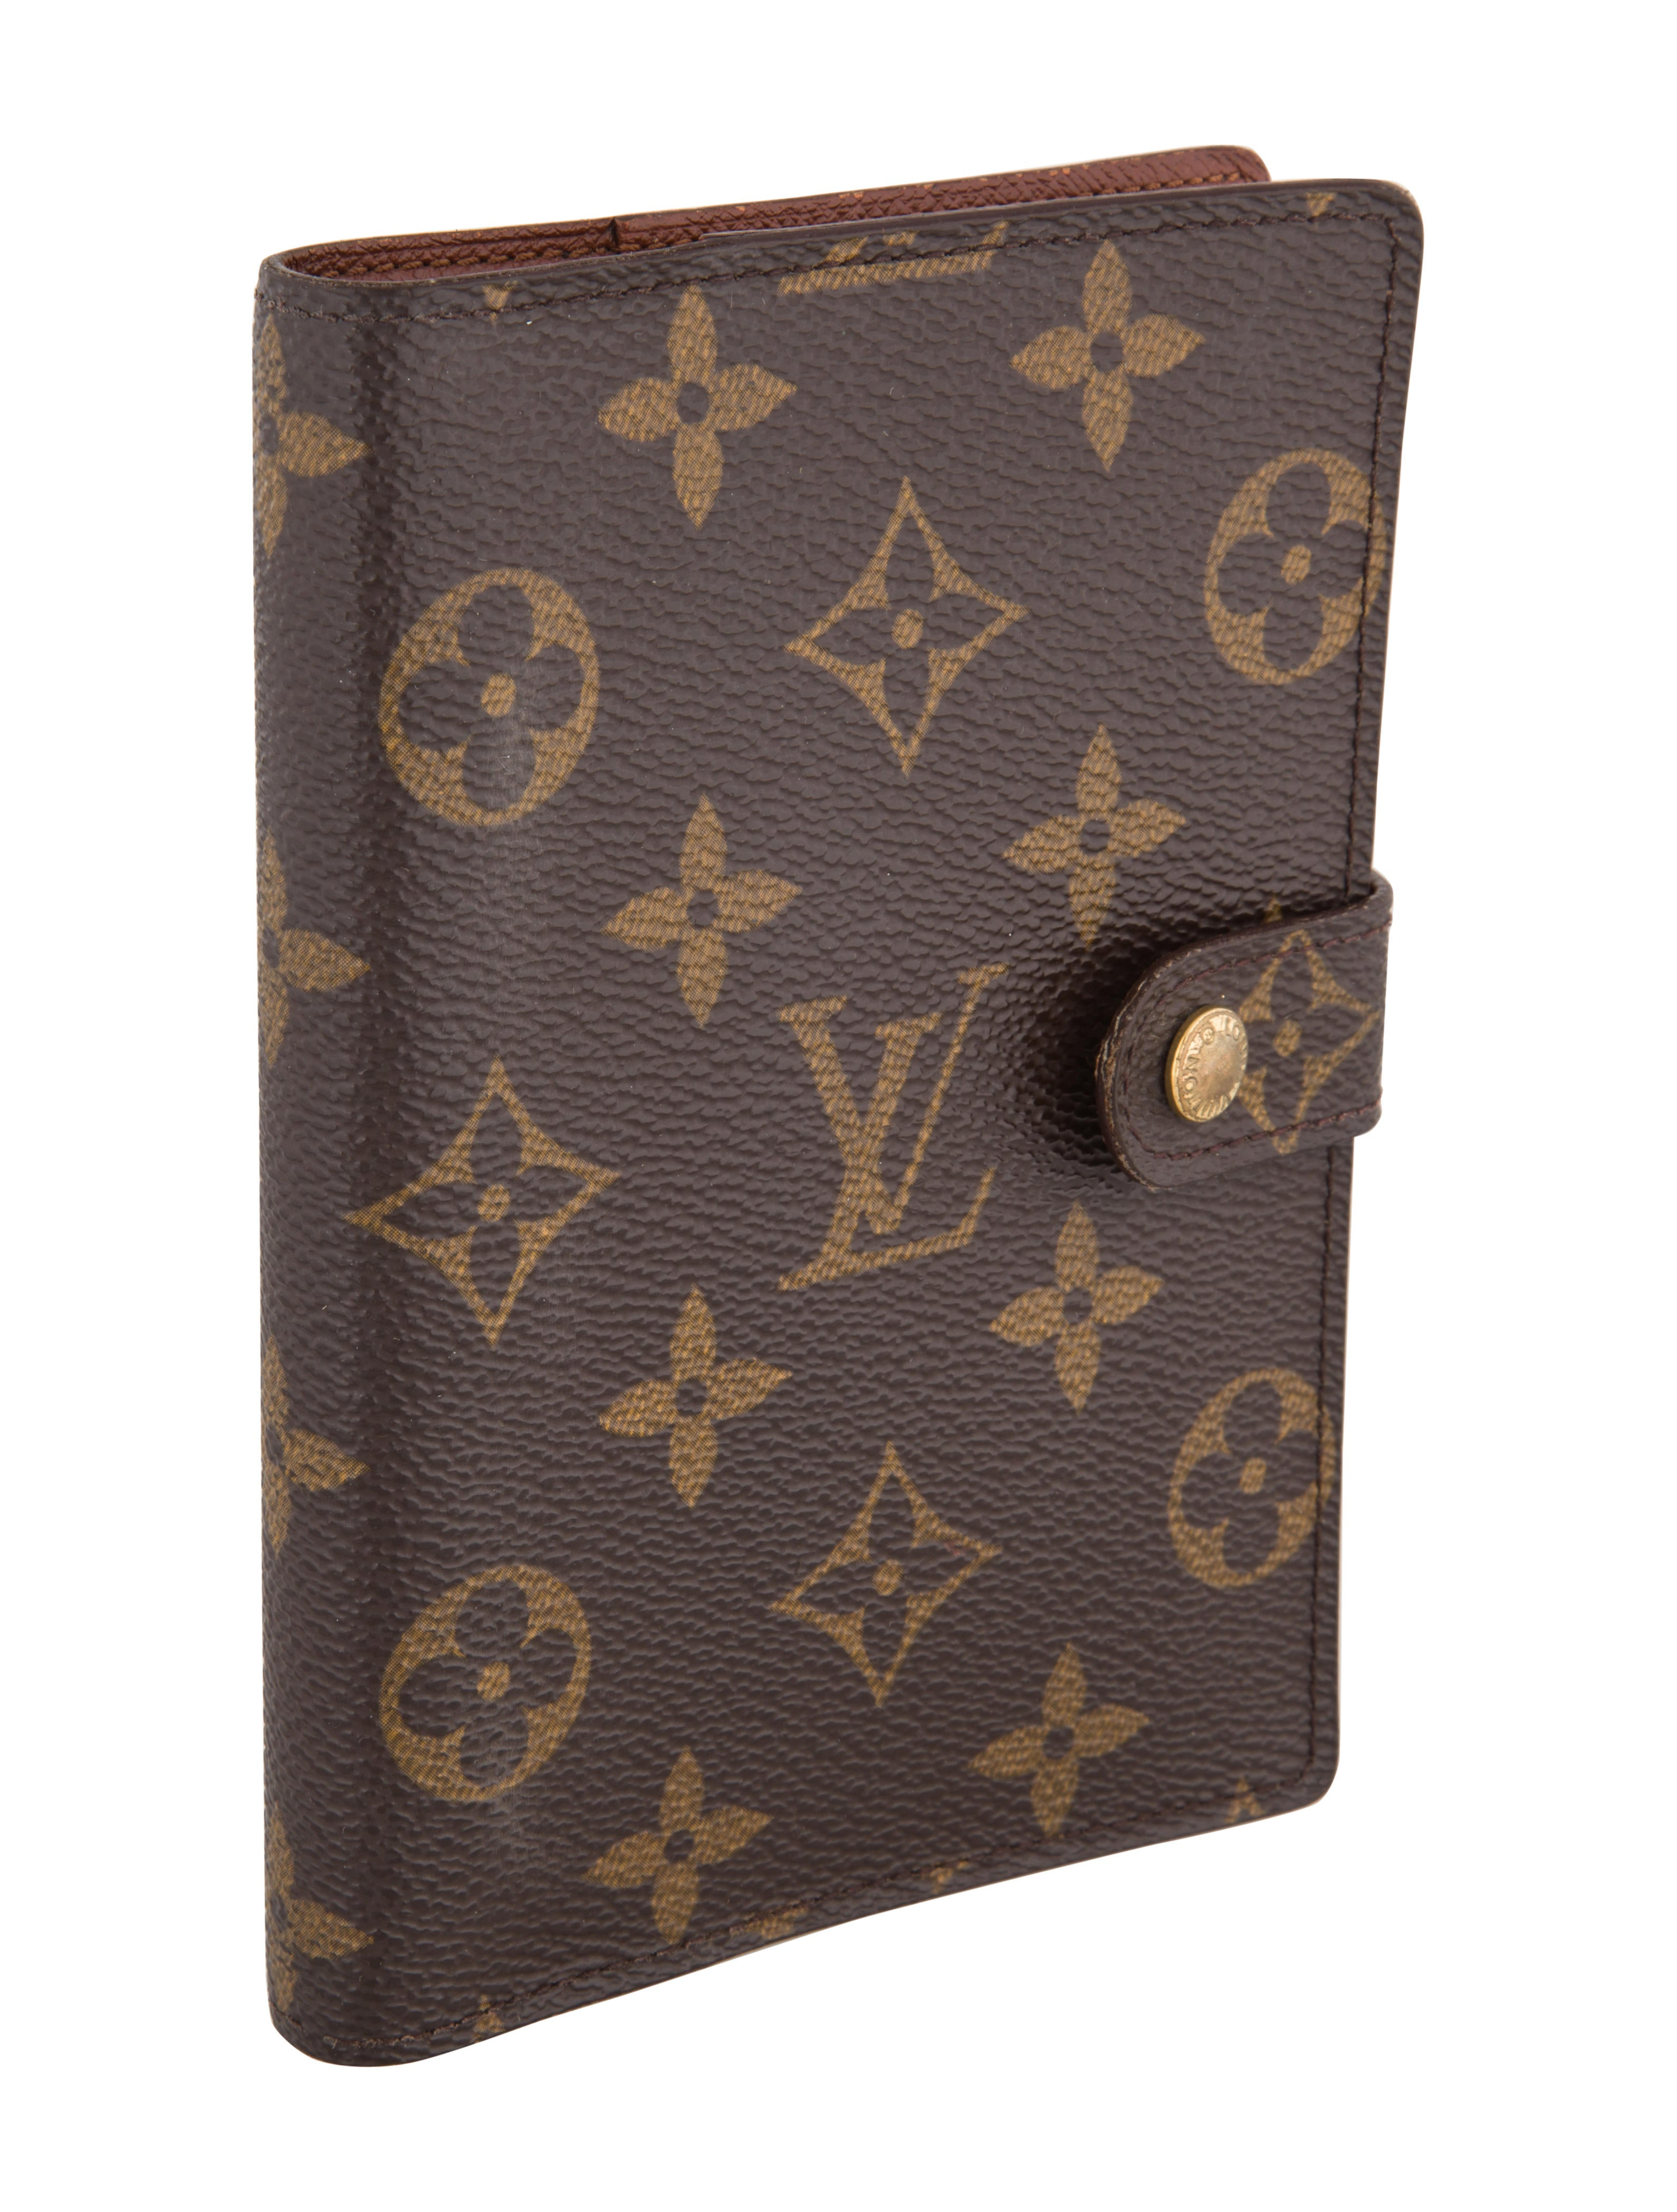 Louis Vuitton Monogram Agenda Cover Decor And